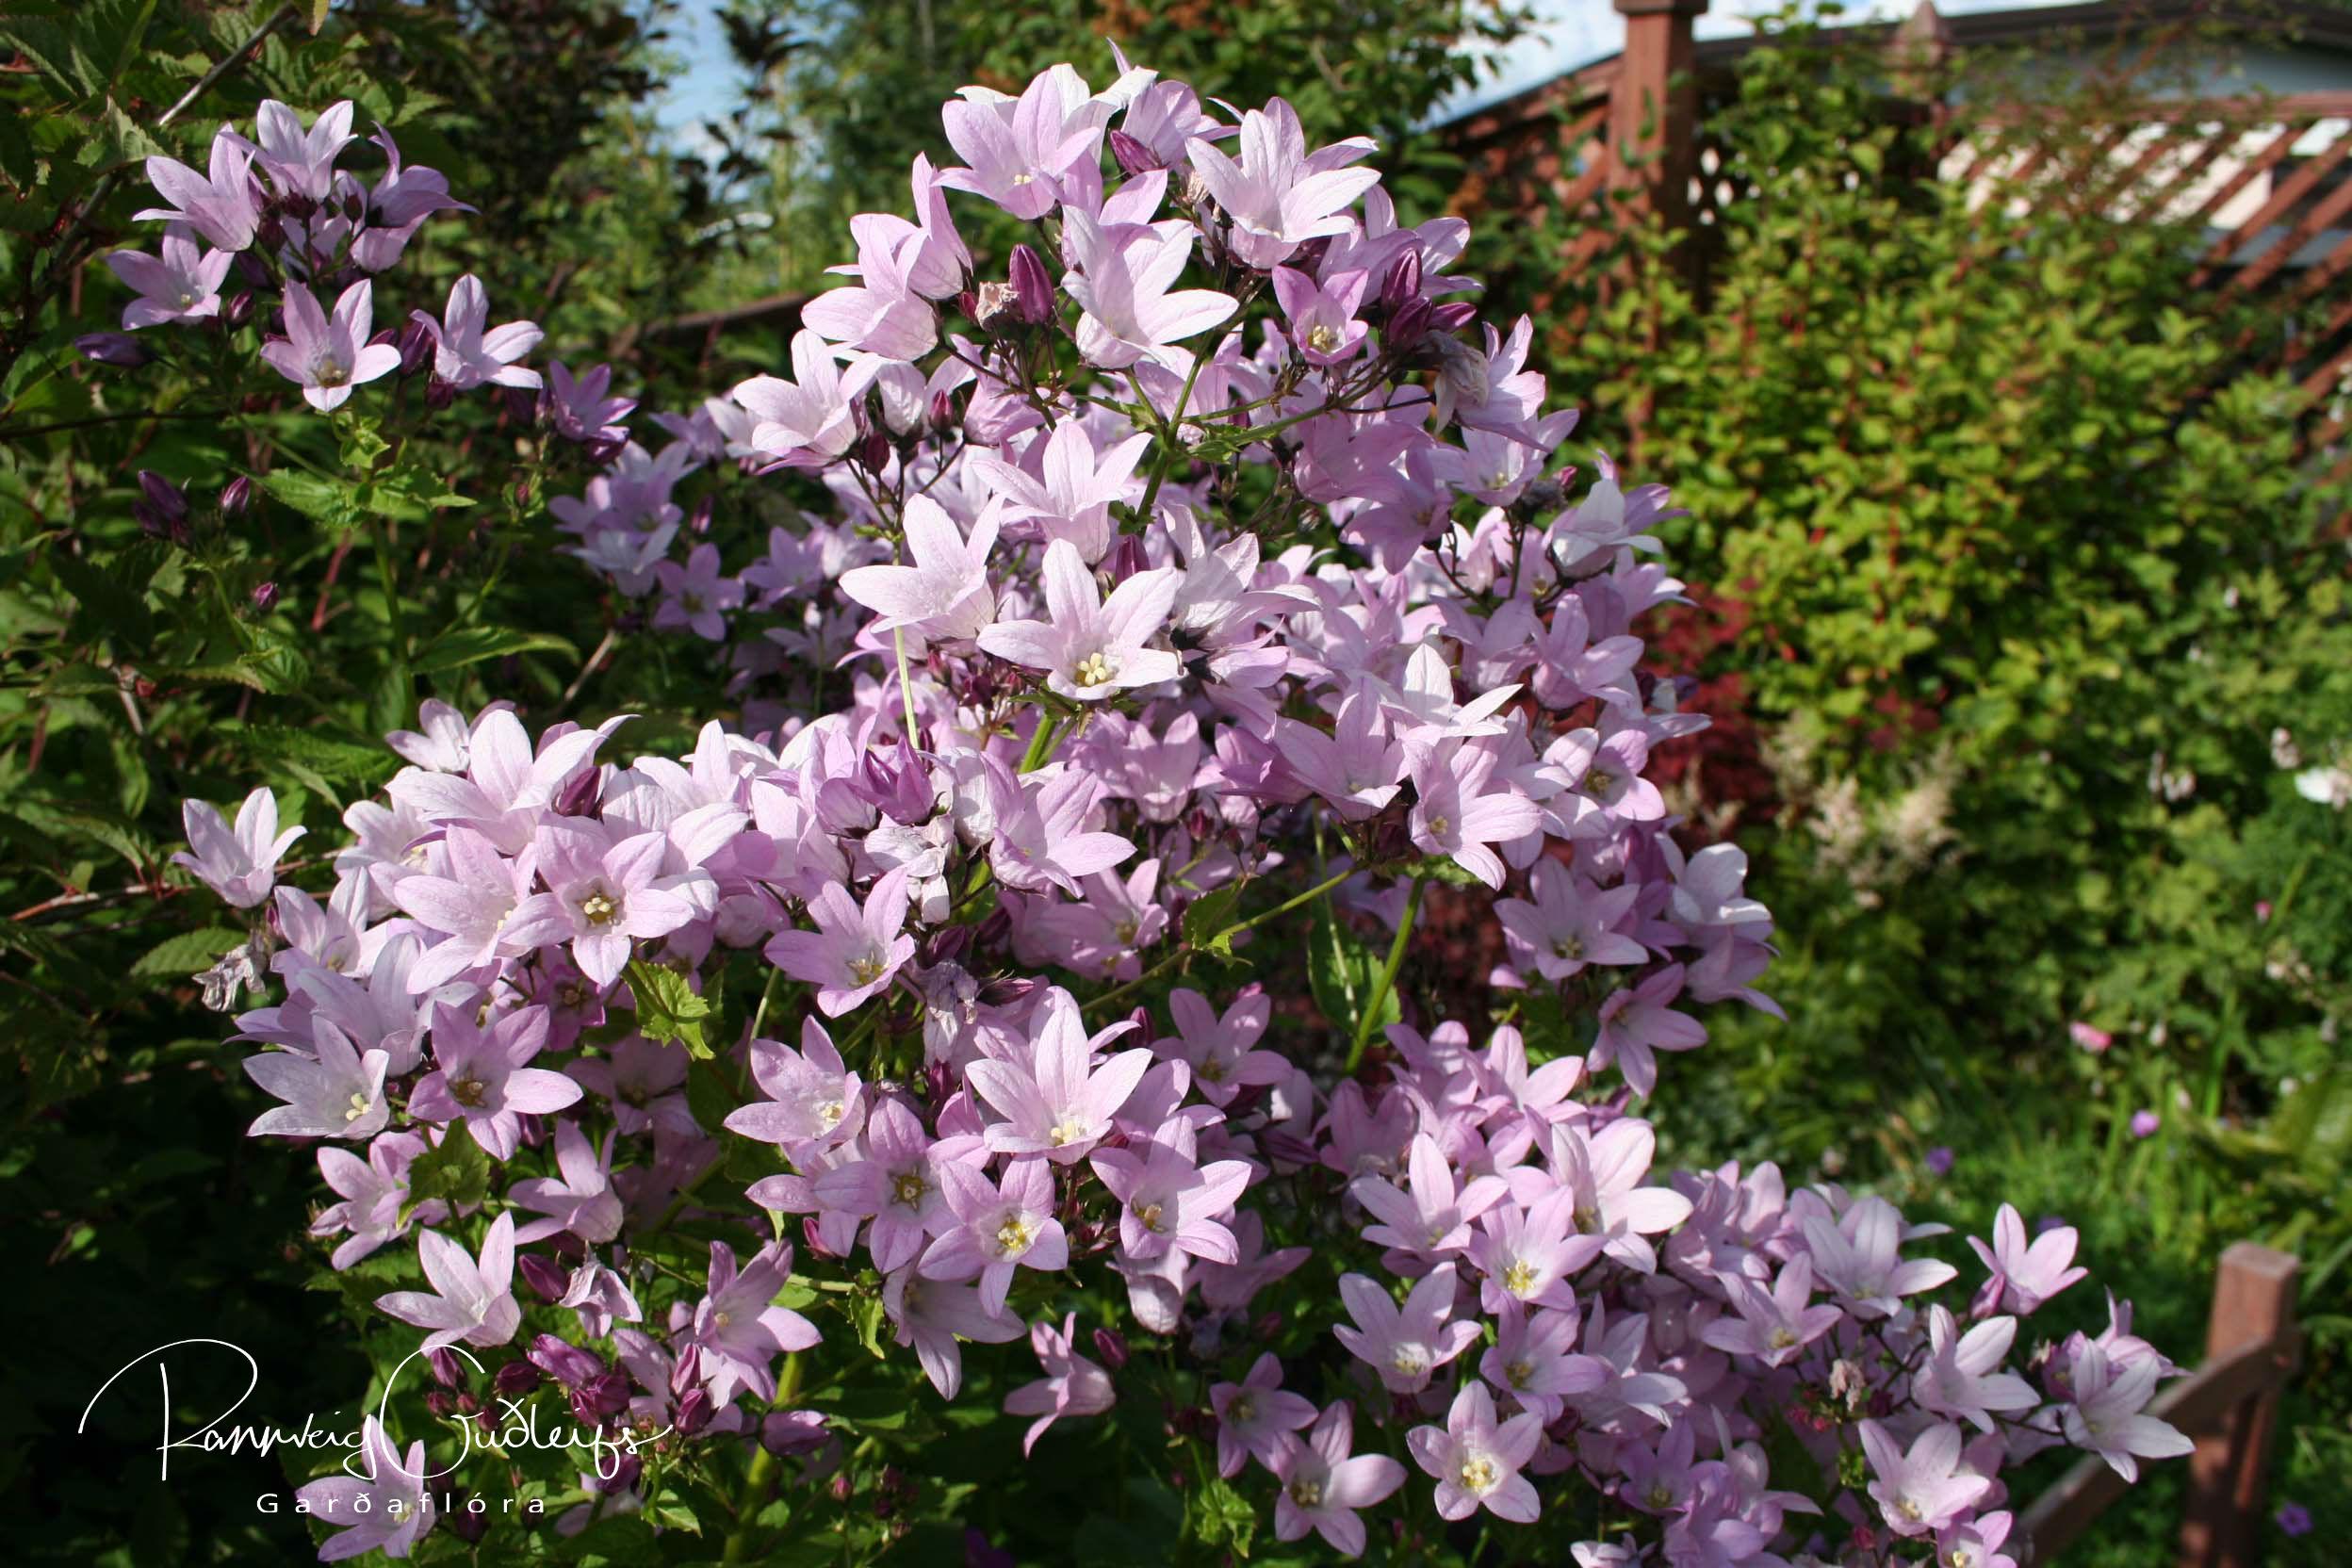 Campanula lactiflora 'Pink Dwarf'